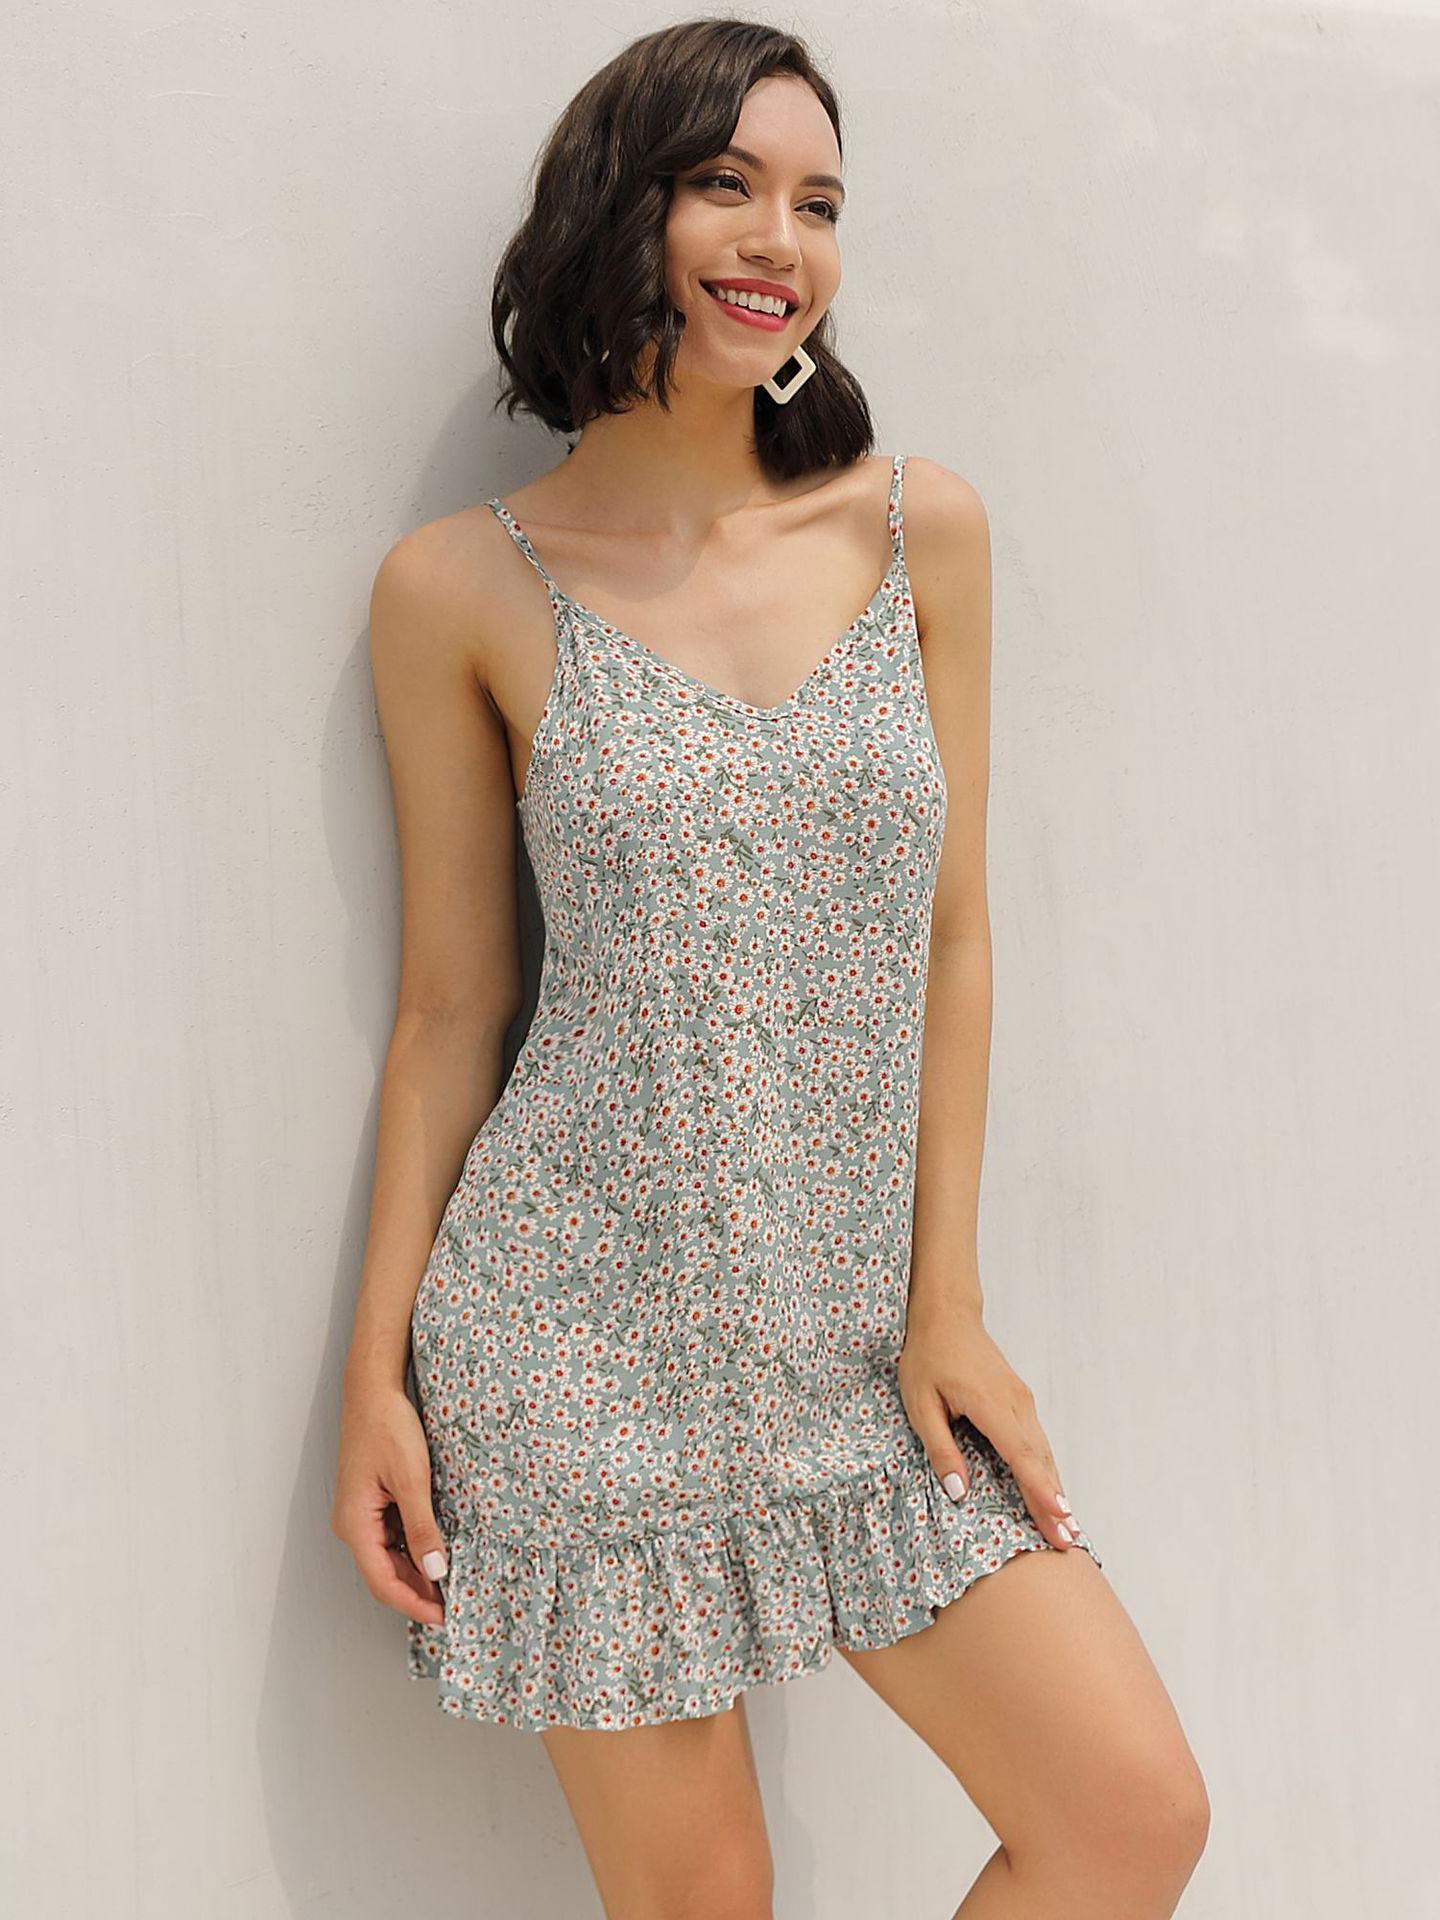 Floral Backless Ruffles Hem Strap Dress